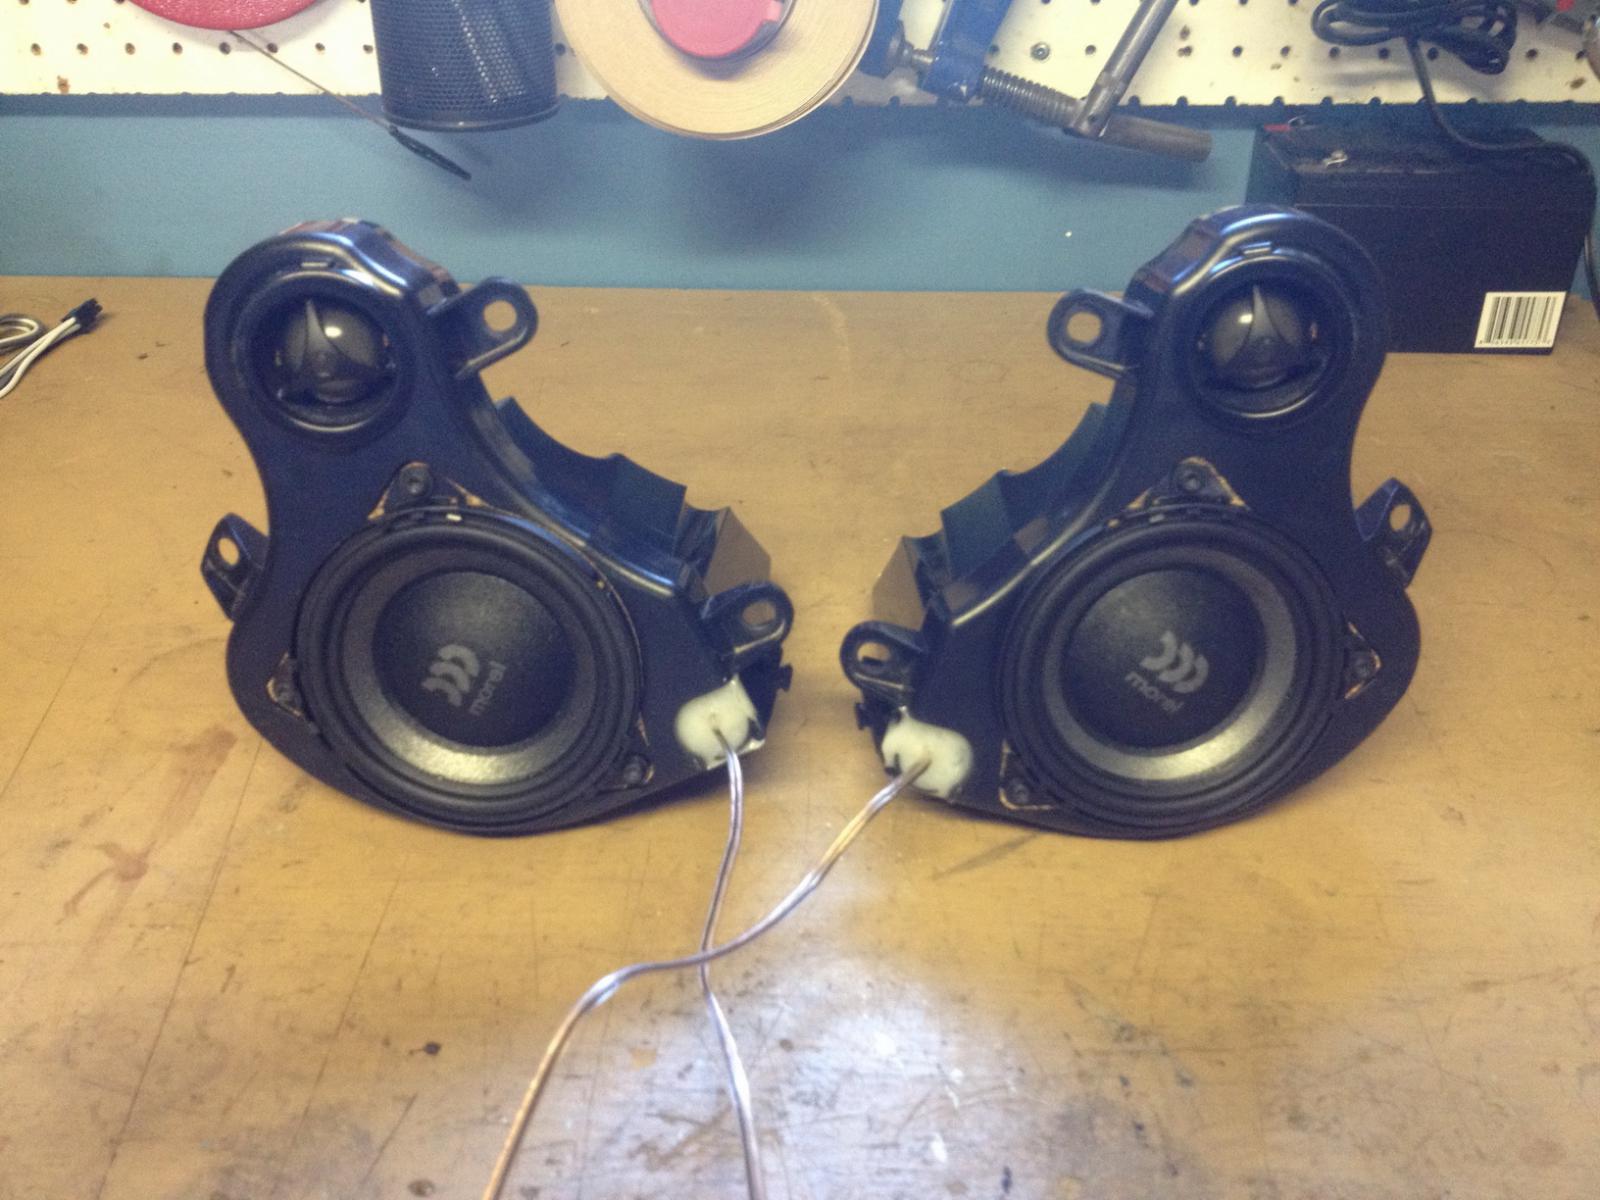 Speaker Wire Gauge >> Replacement original speakers - Page 49 - BMW K1600 Forum : BMW K1600 GT and GTL Forums